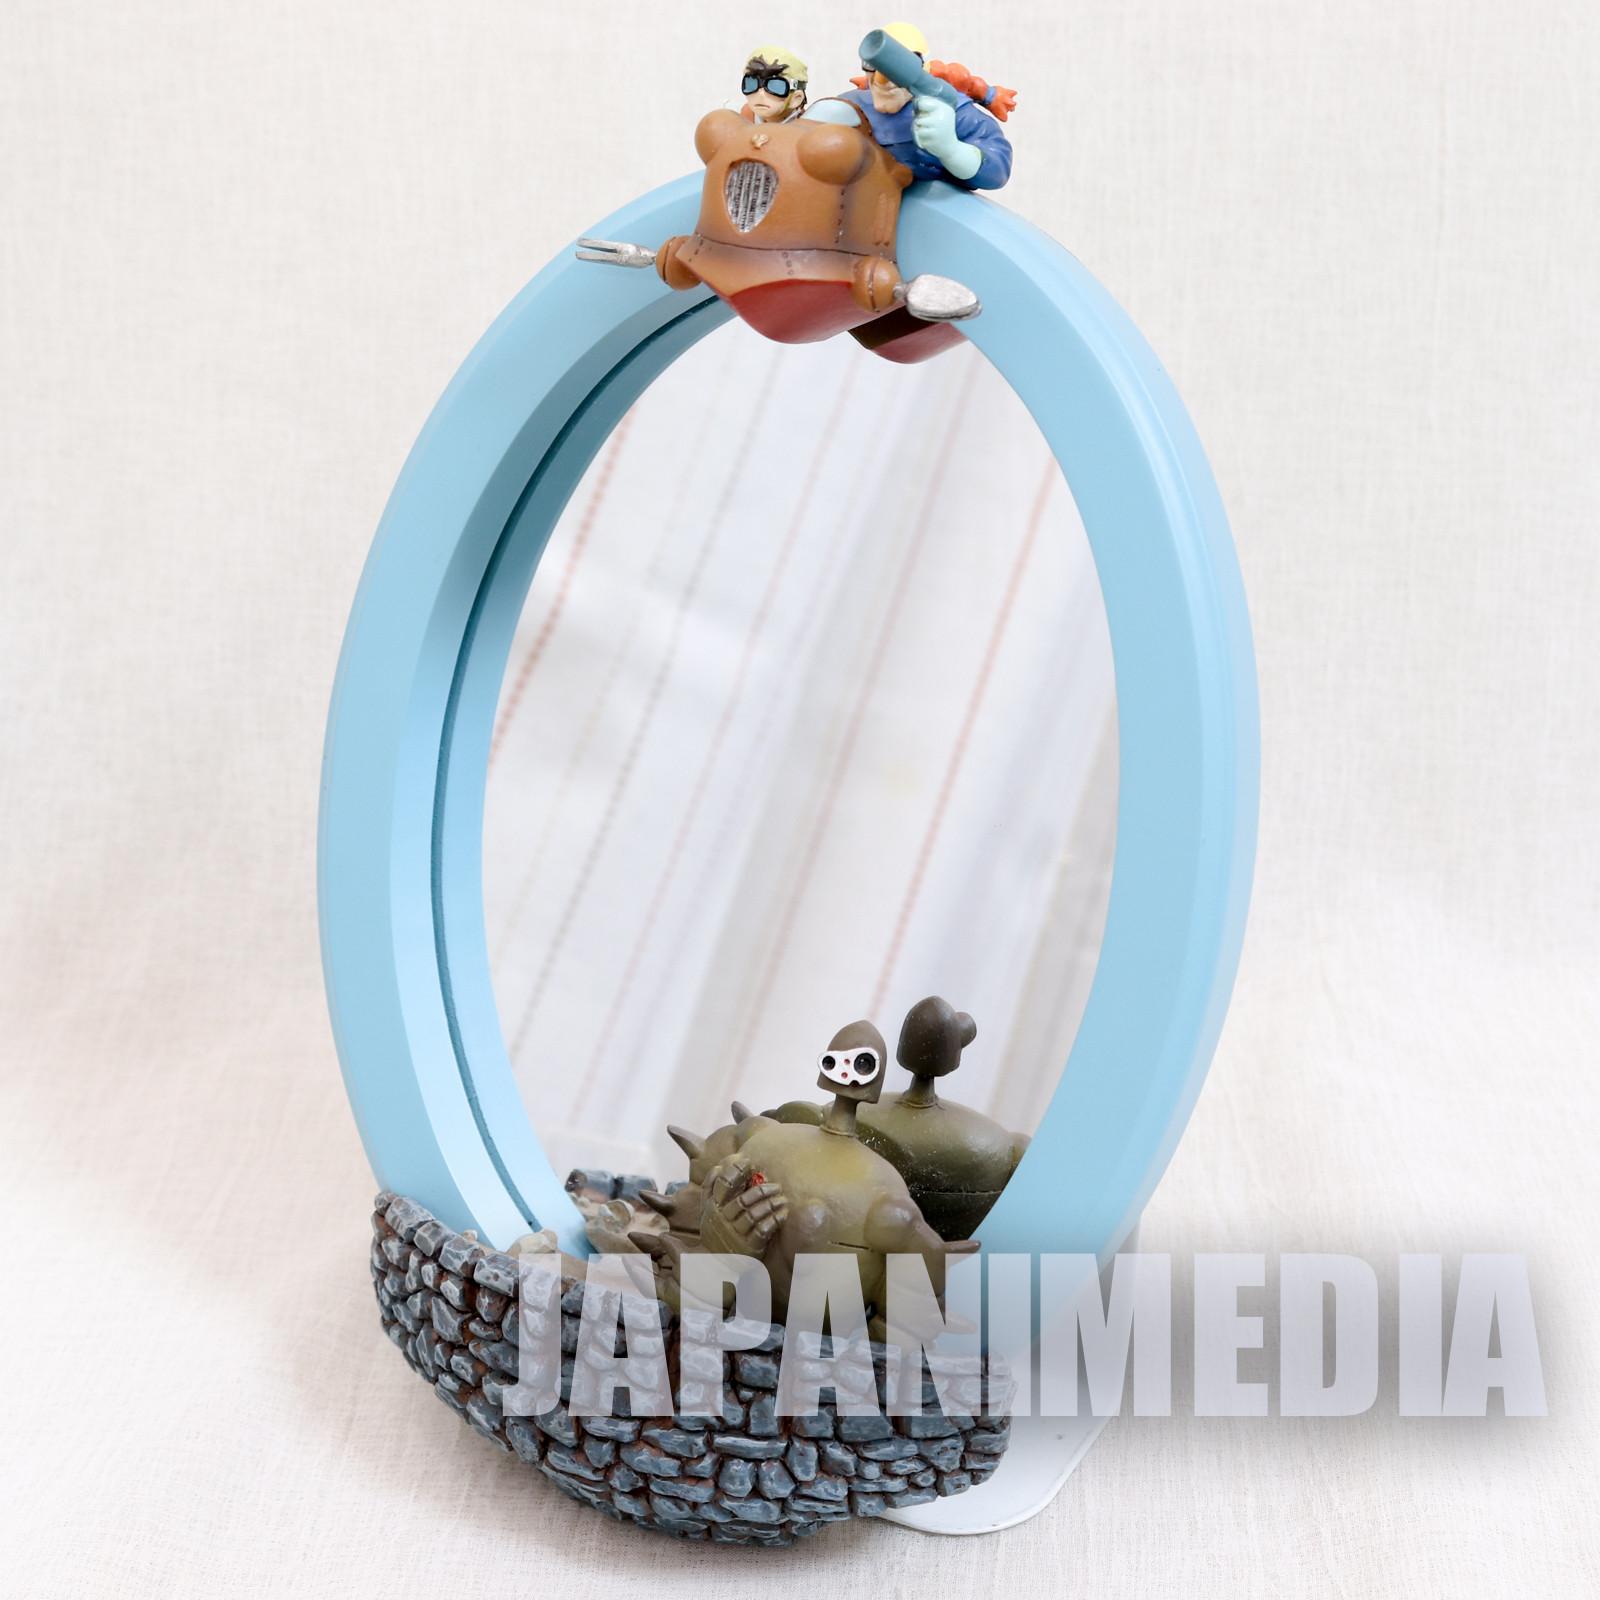 Castle in the Sky Pazu & Dora Robot Soldier Wall Hanging Mirror Ghibli